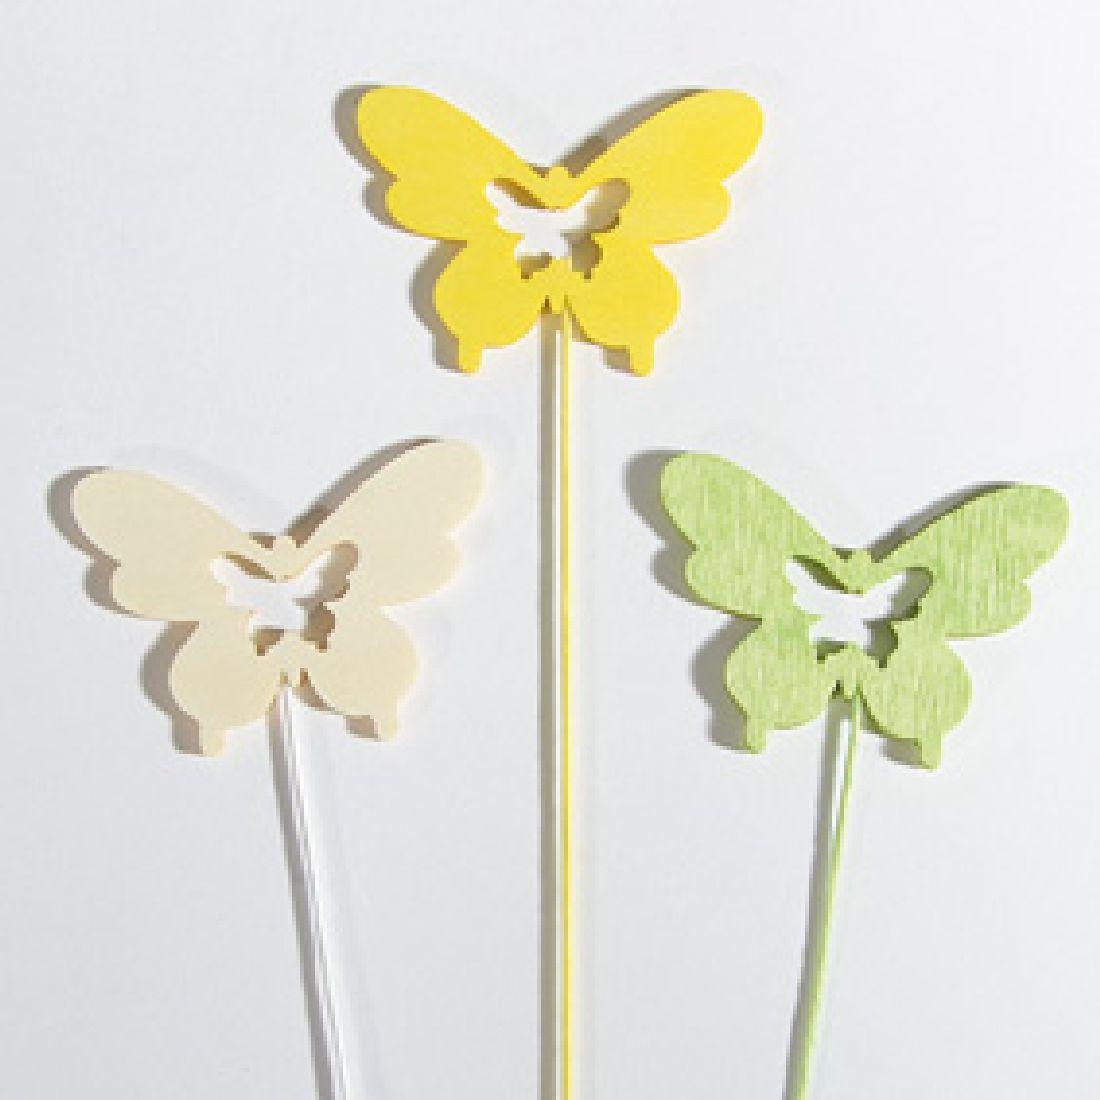 Schmetterling Woody WEISS-GELB 34844 Stecker 6cm Holz